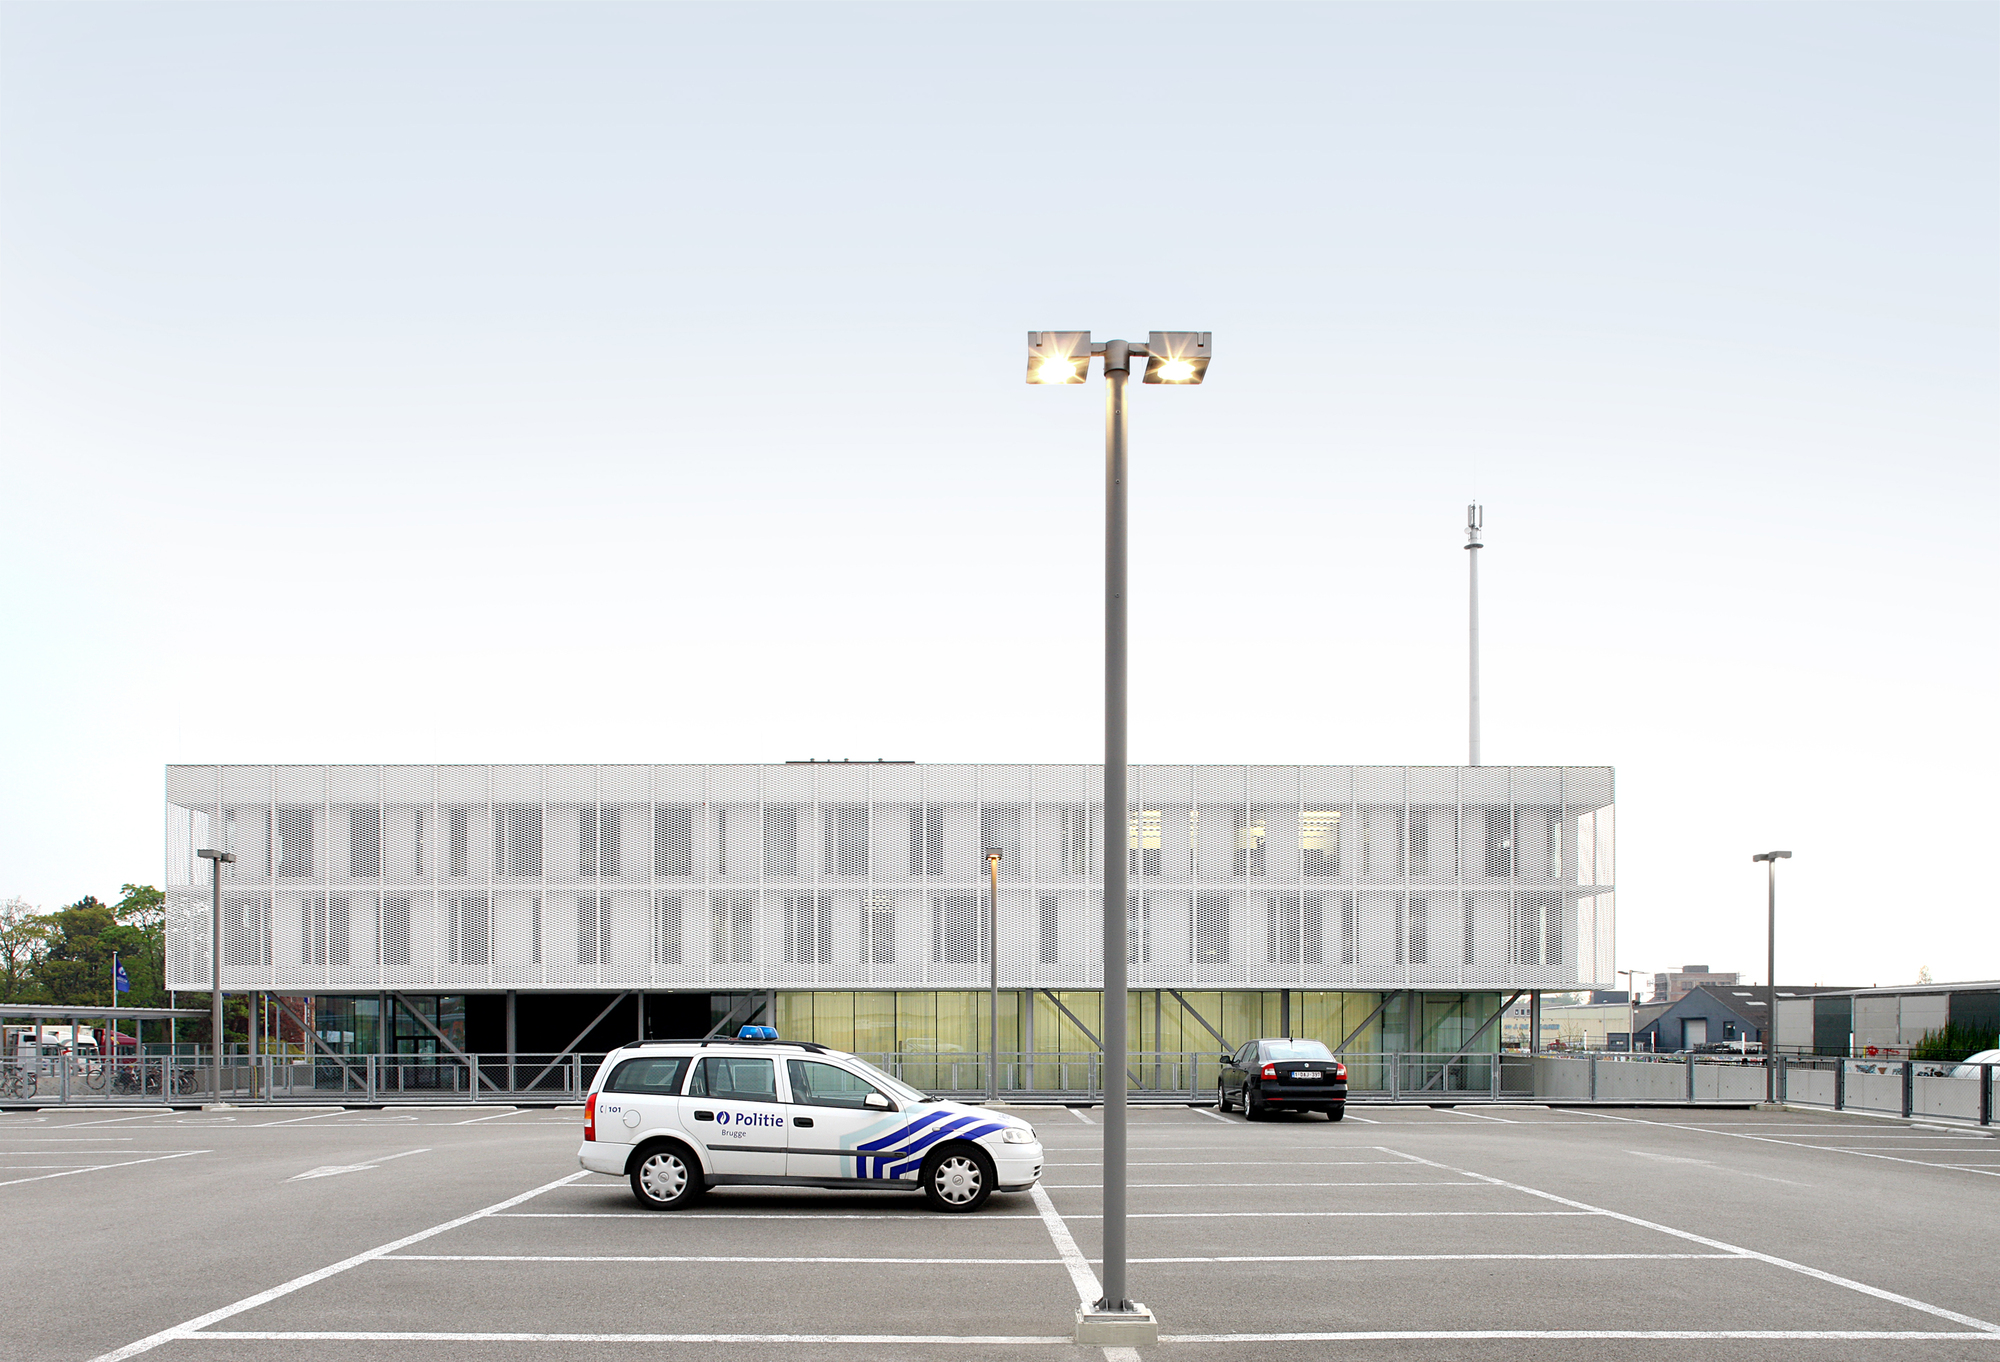 51abff1eb3fc4b70310000dc_politiecommissariaat-brugge-beel-achtergael-architecten